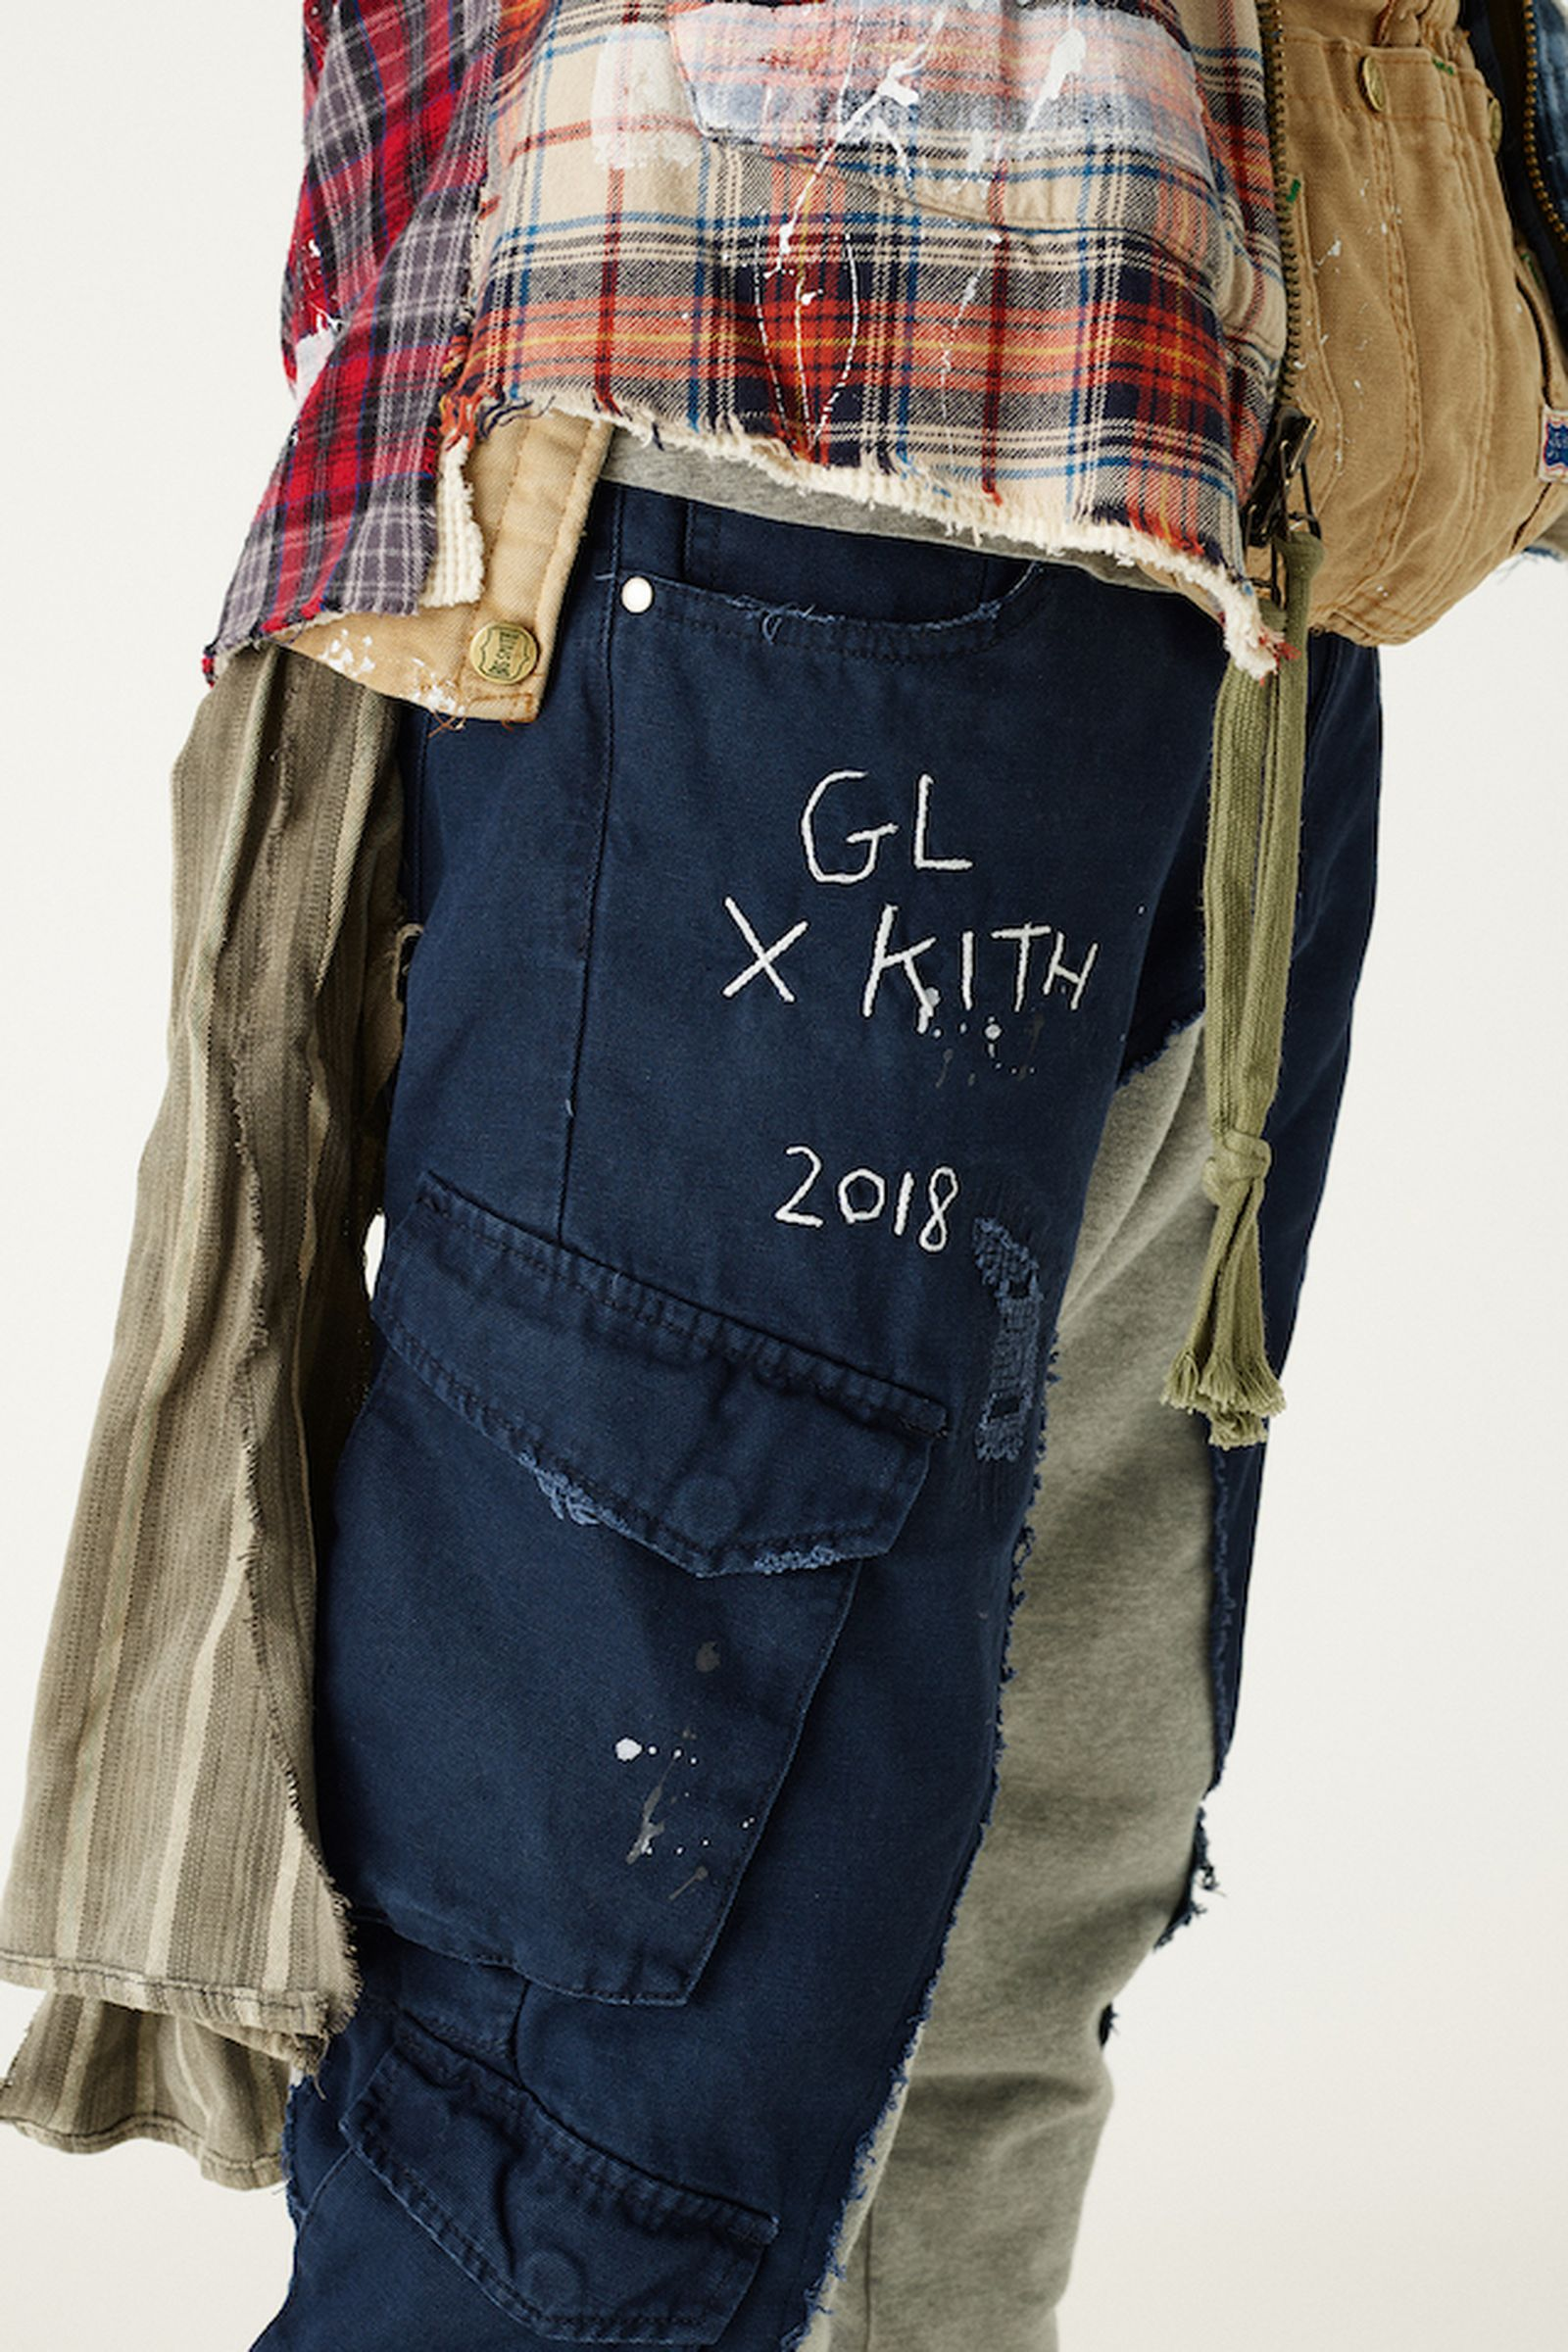 kith greg lauren fw18 ivy league draft